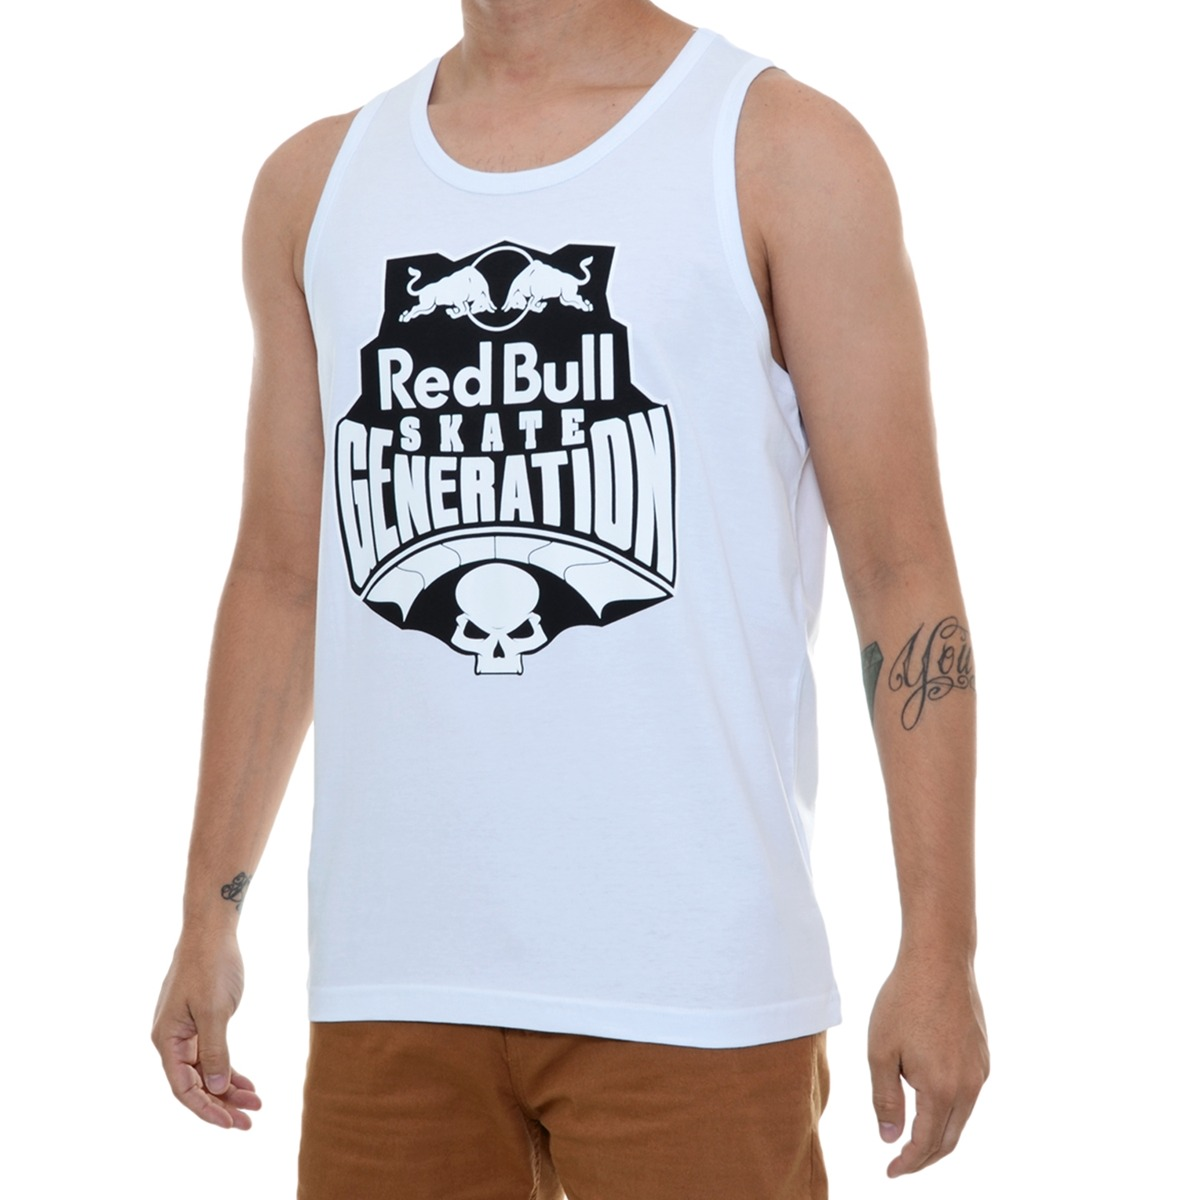 camiseta masculina red bull regata skate generation branca. Carregando zoom. a3647769e2b